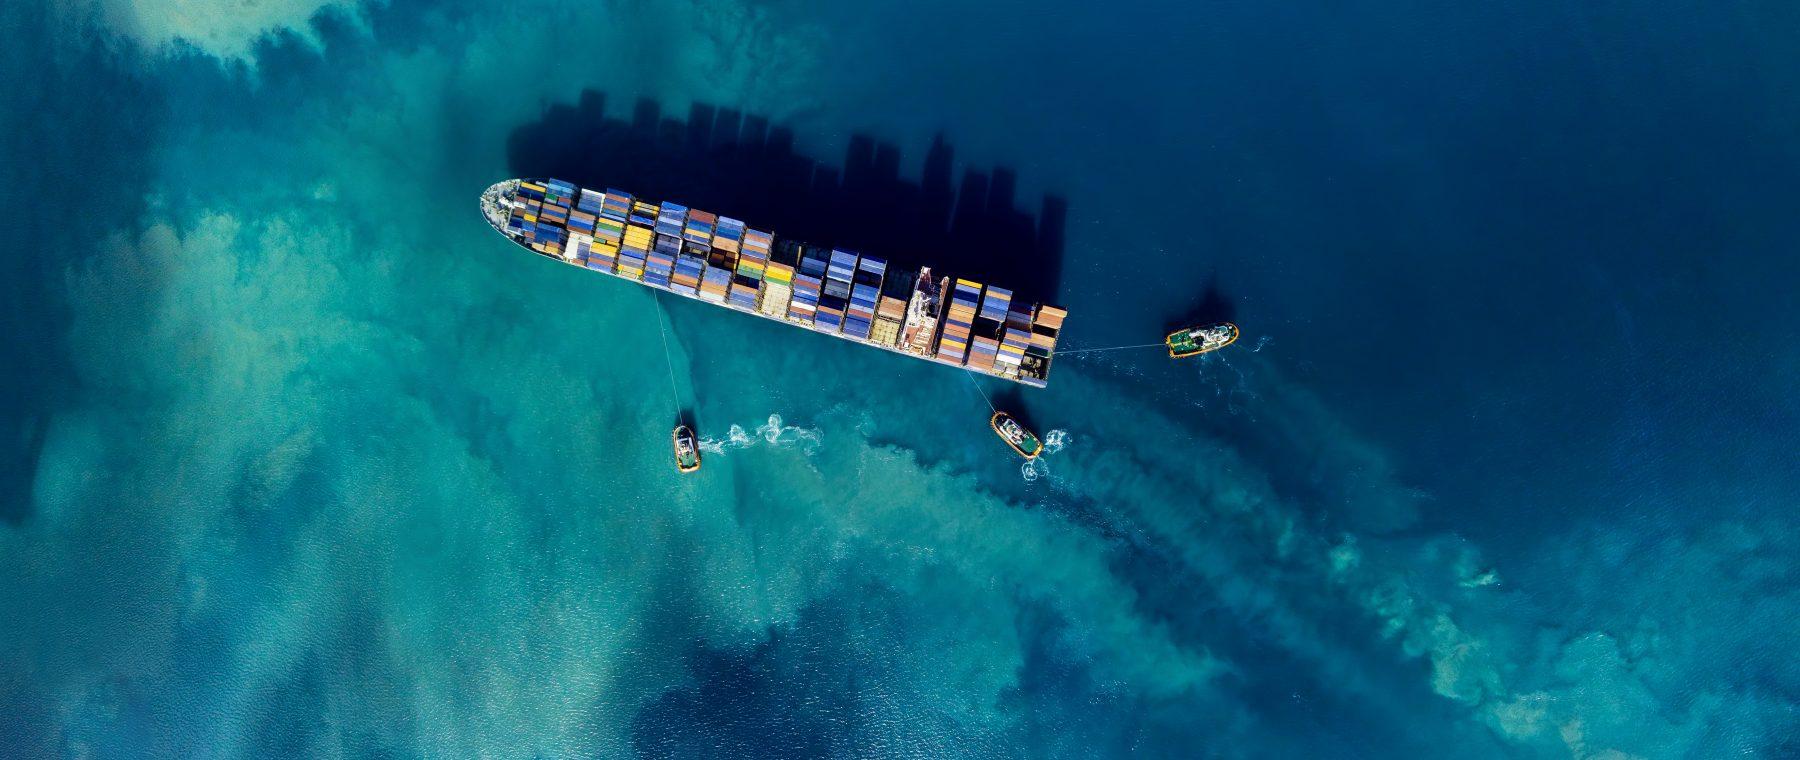 The Benefits of a Centralized Port Data Platform – GISGRO Utilizer 2.0